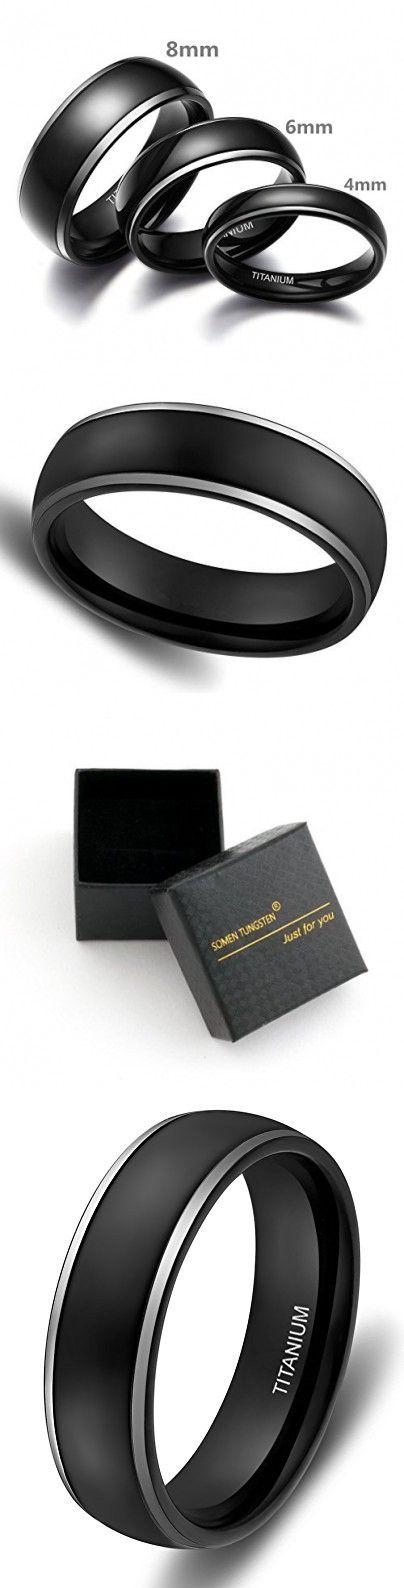 4mm 6mm 8mm Titanium Rings Black Dome Two Tone Polish Wedding Engagement Band for Men Women (6mm (Titanium), 9.5)